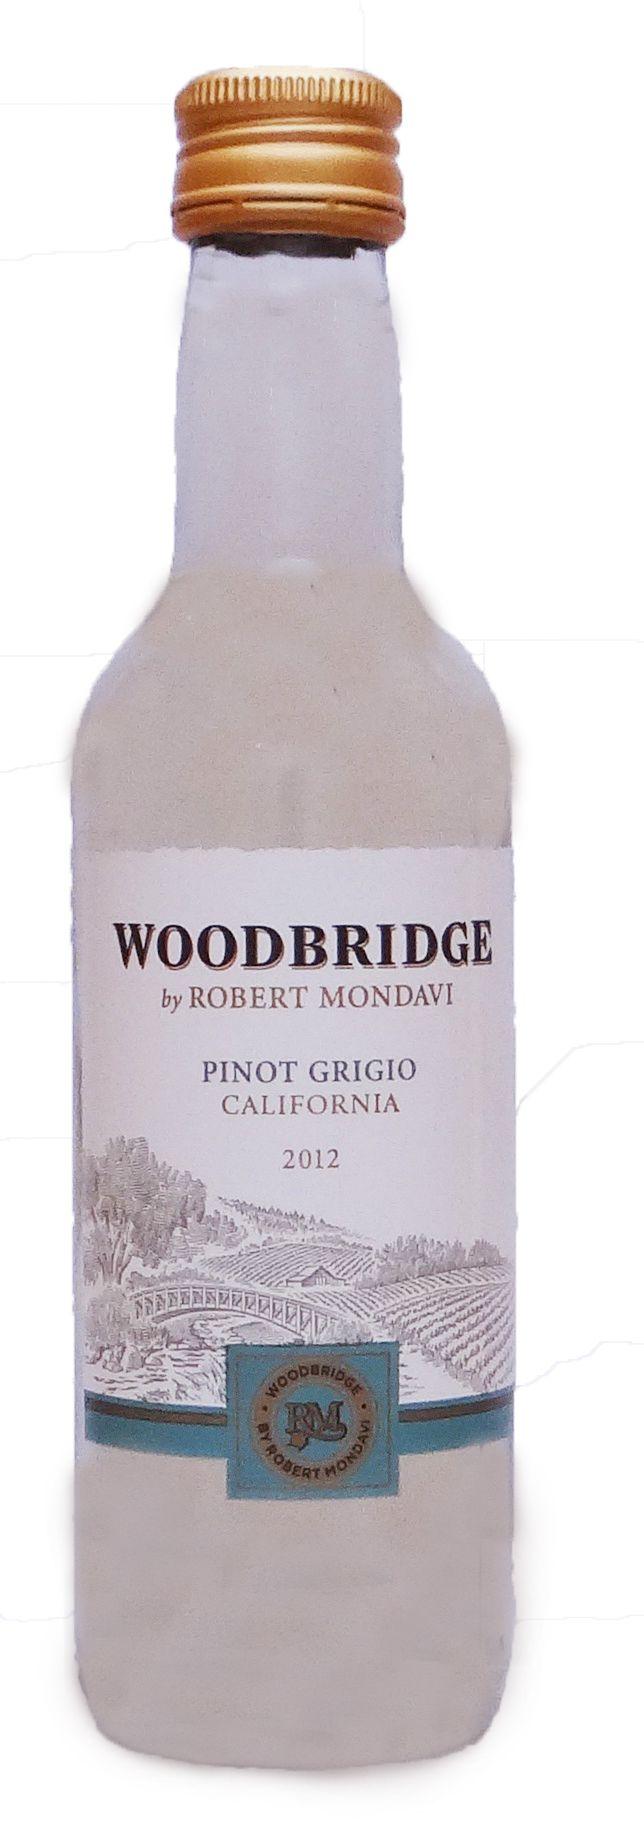 Mini bottle of Woodbridge Pinot Grigio wine   Wedding ideas ...